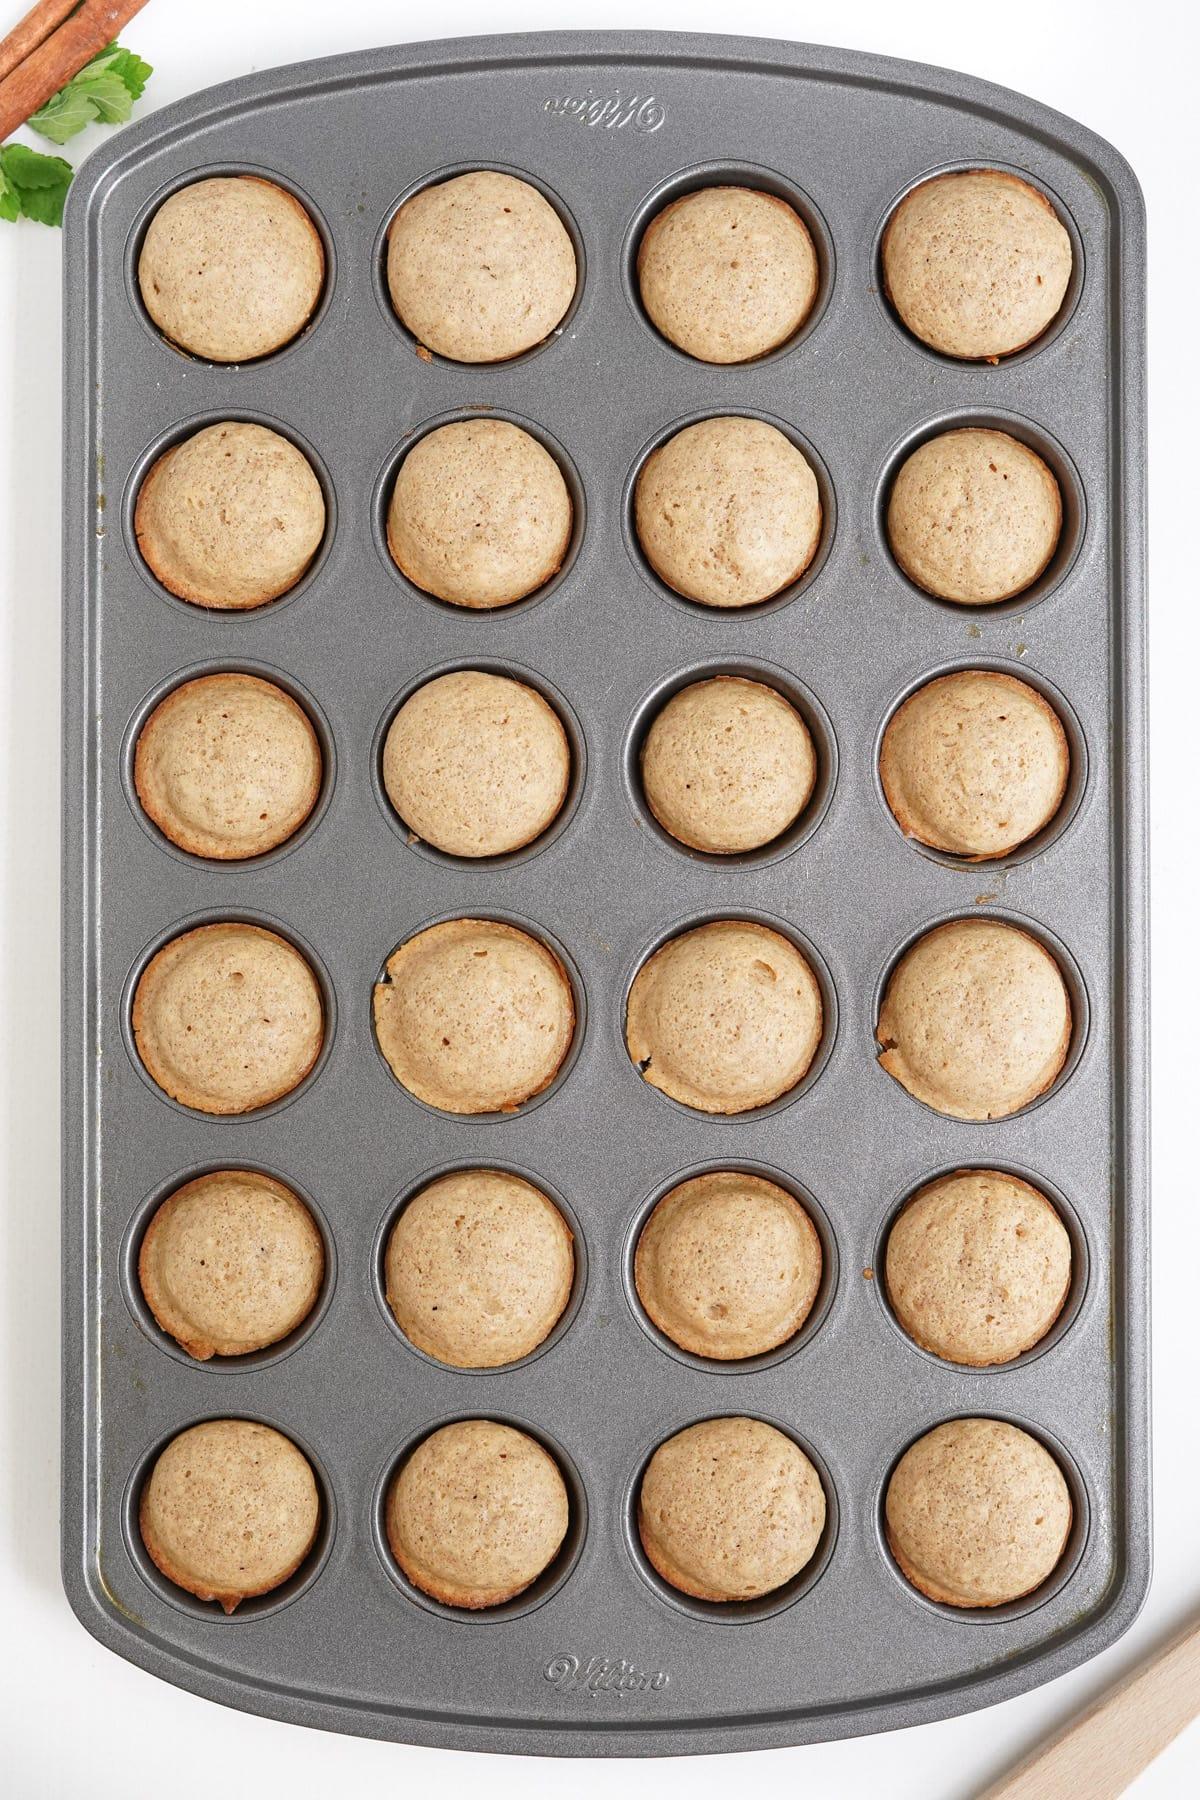 baked doughnut in mini muffin pan